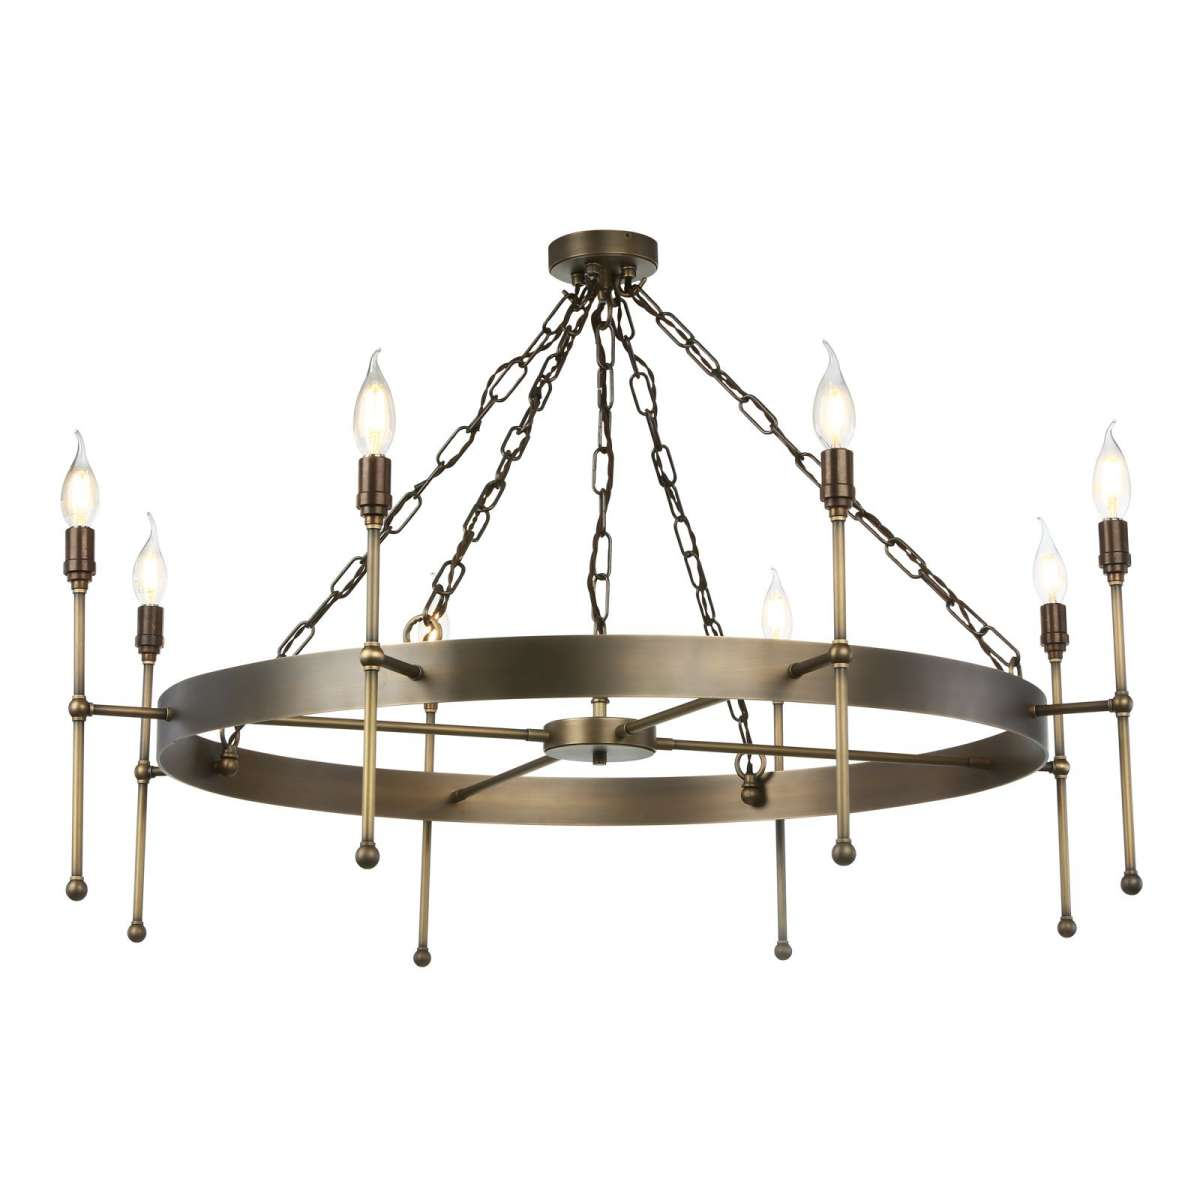 Durrell 8 Light Solid Antique Brass Pendant